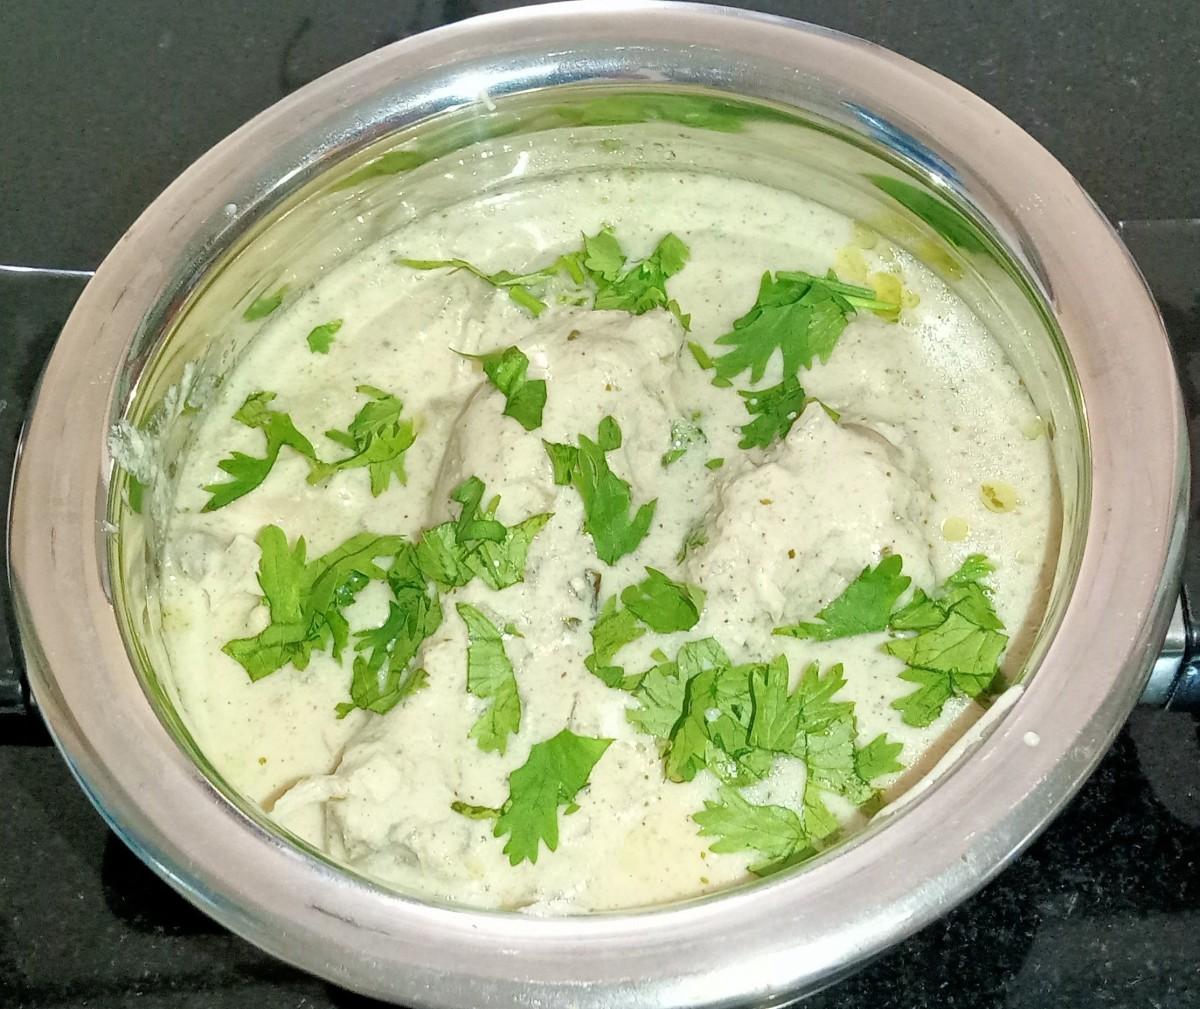 Chicken malai handi garnished with coriander leaves